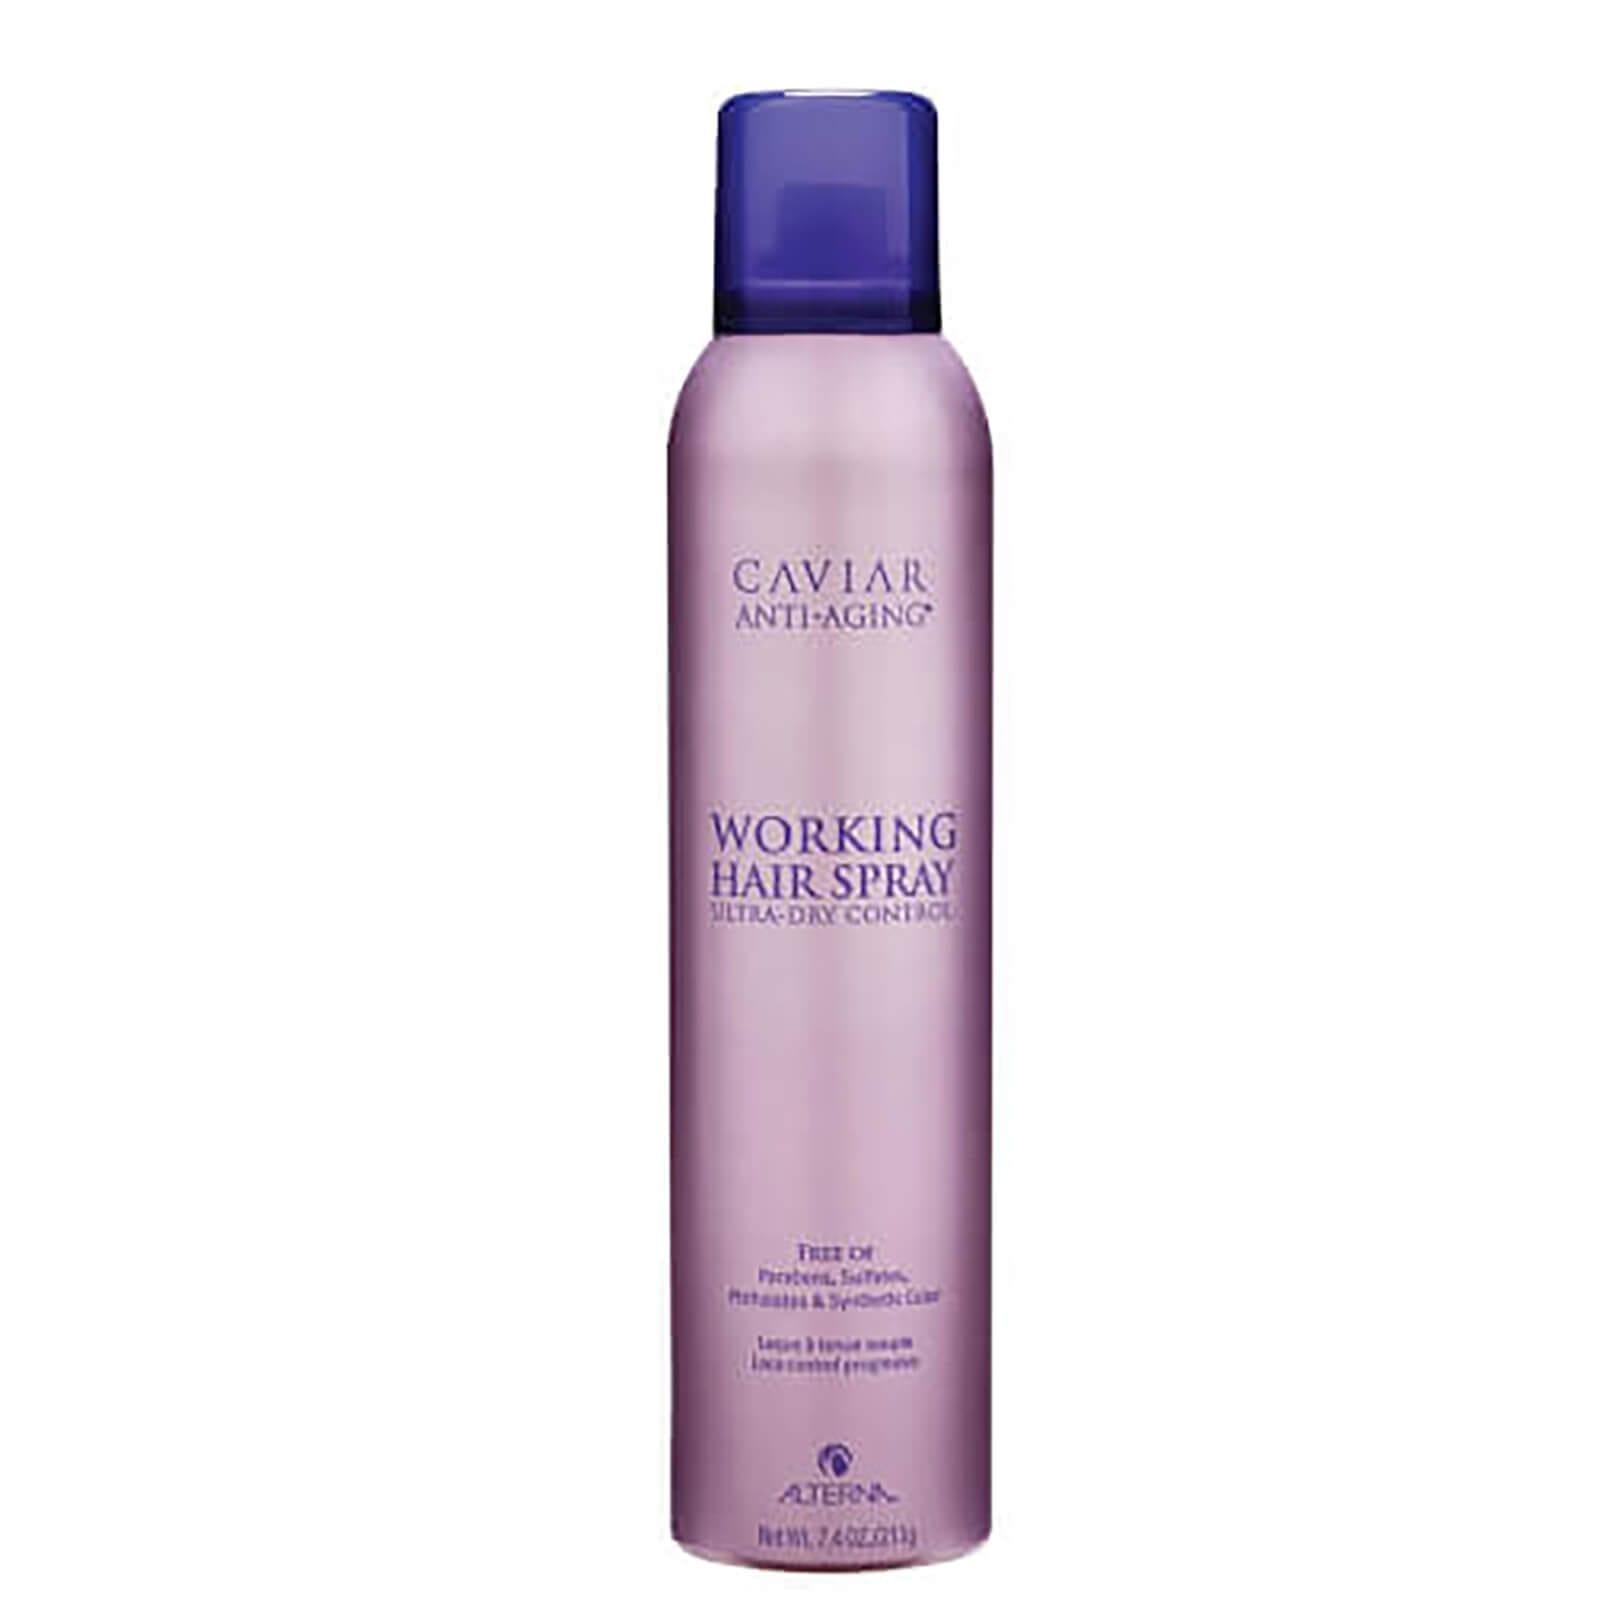 Alterna Caviar Working Hair Spray 250ml